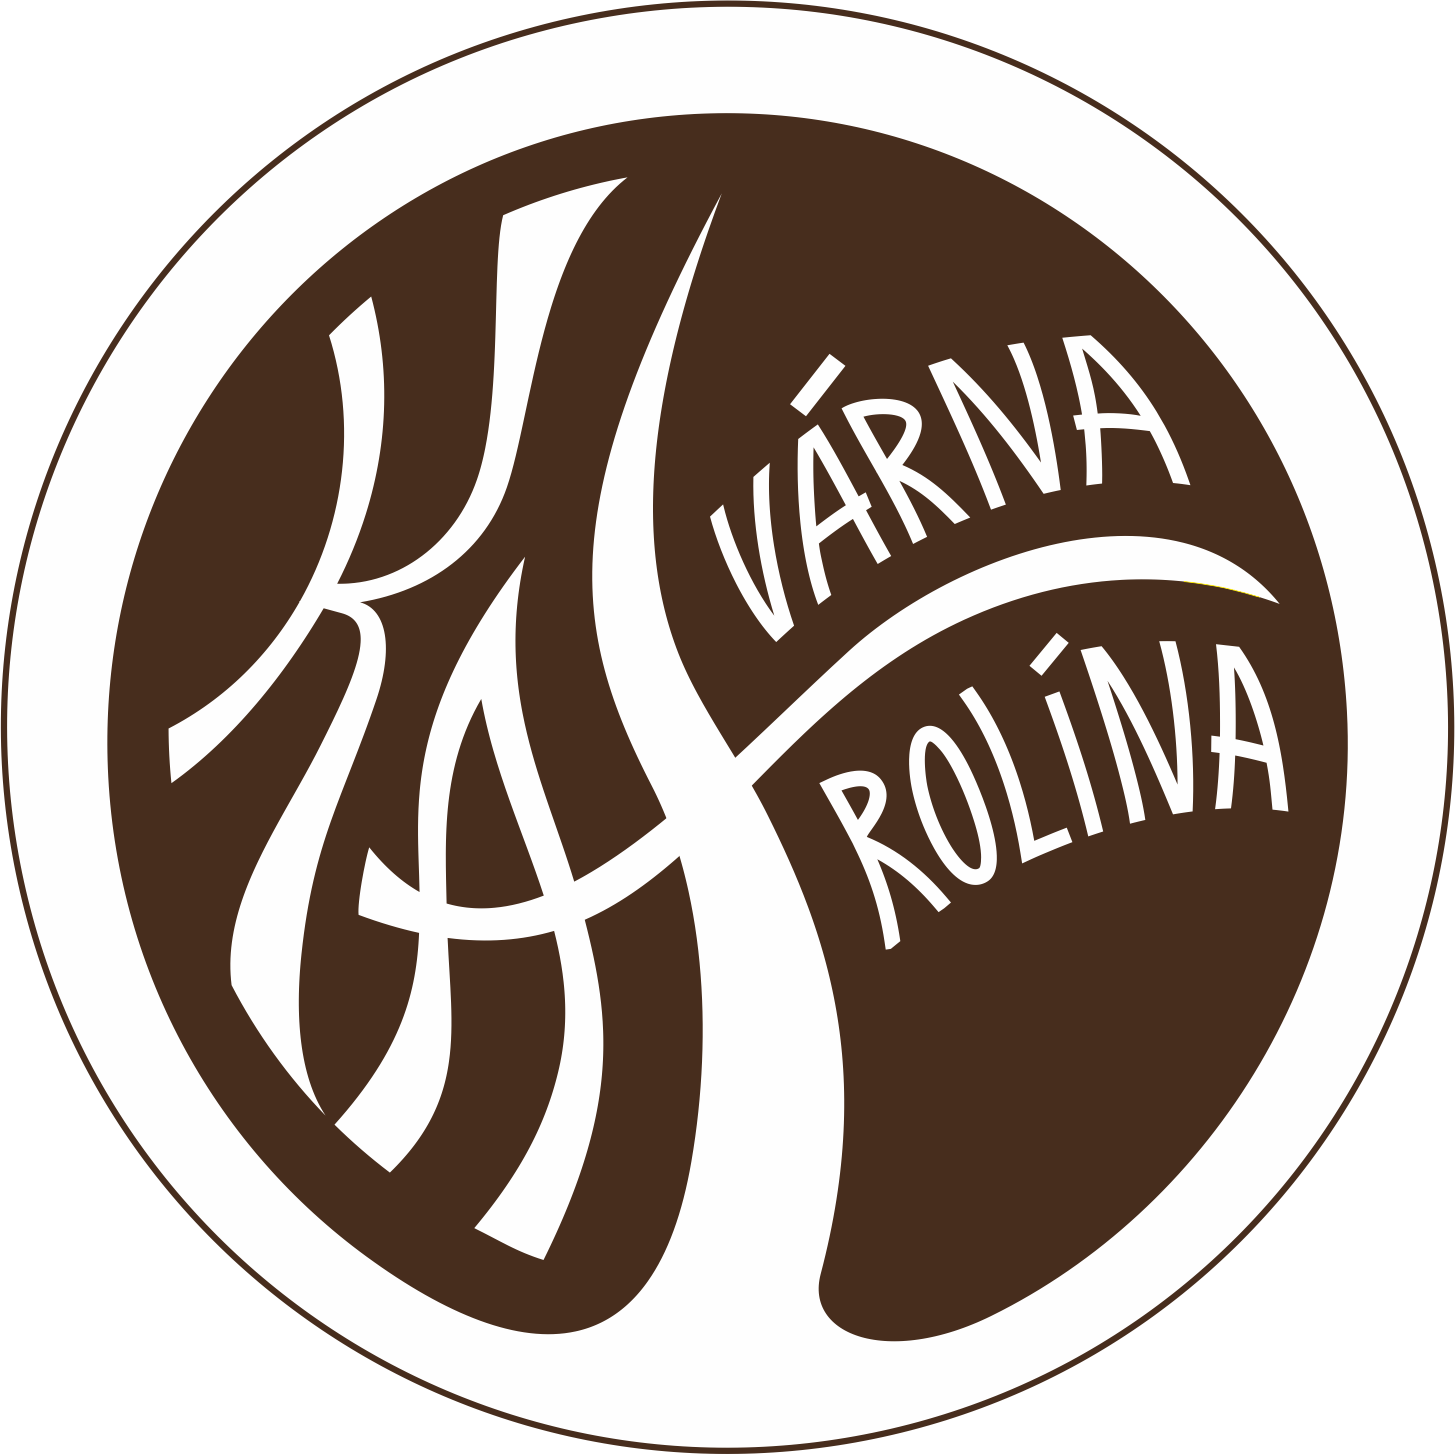 kavarnakarolina.cz